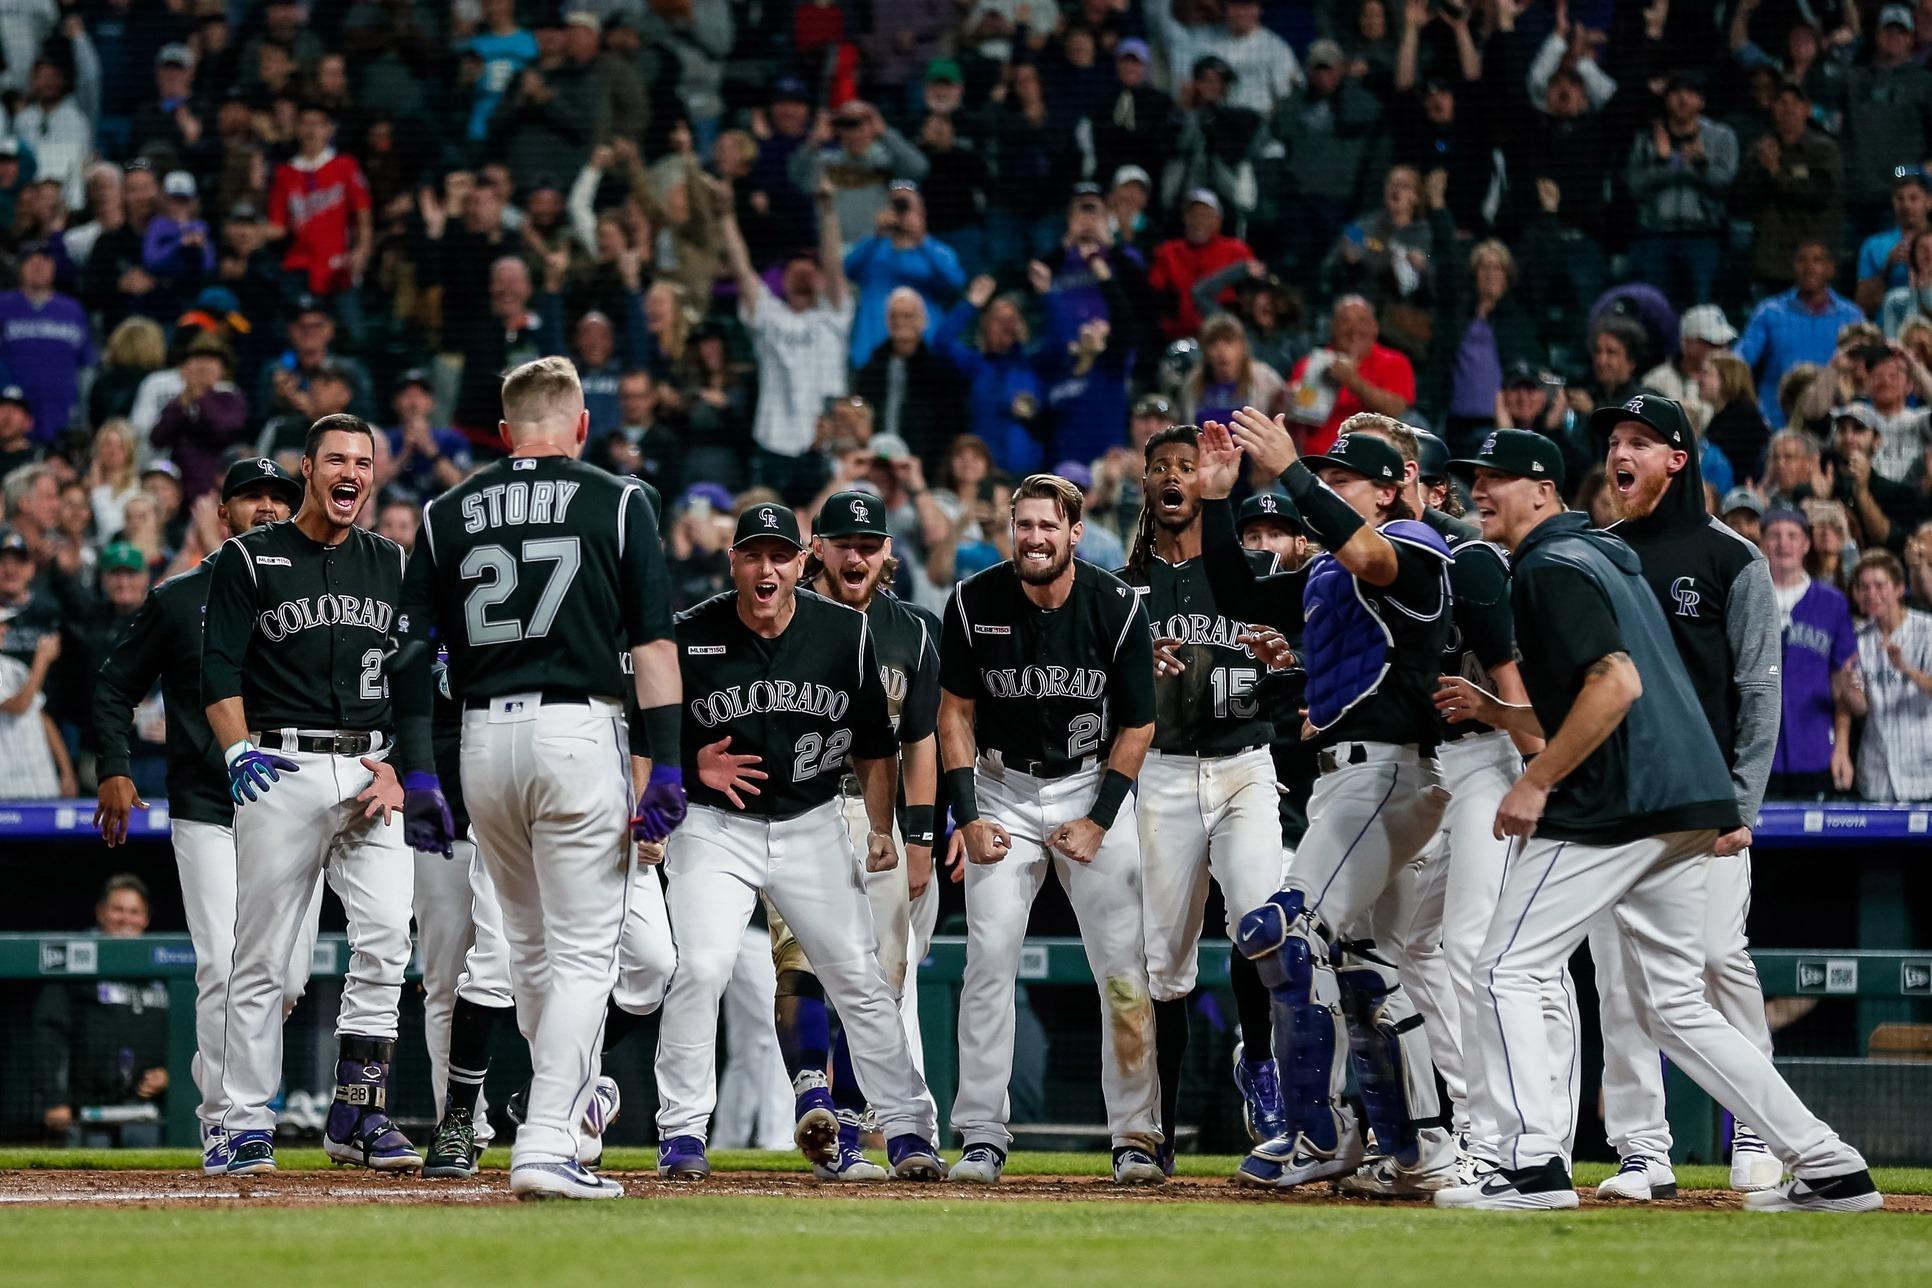 Rockies Review, Weekend of May 22-24: Records pile up for Rockies shortstop in walk-off winner